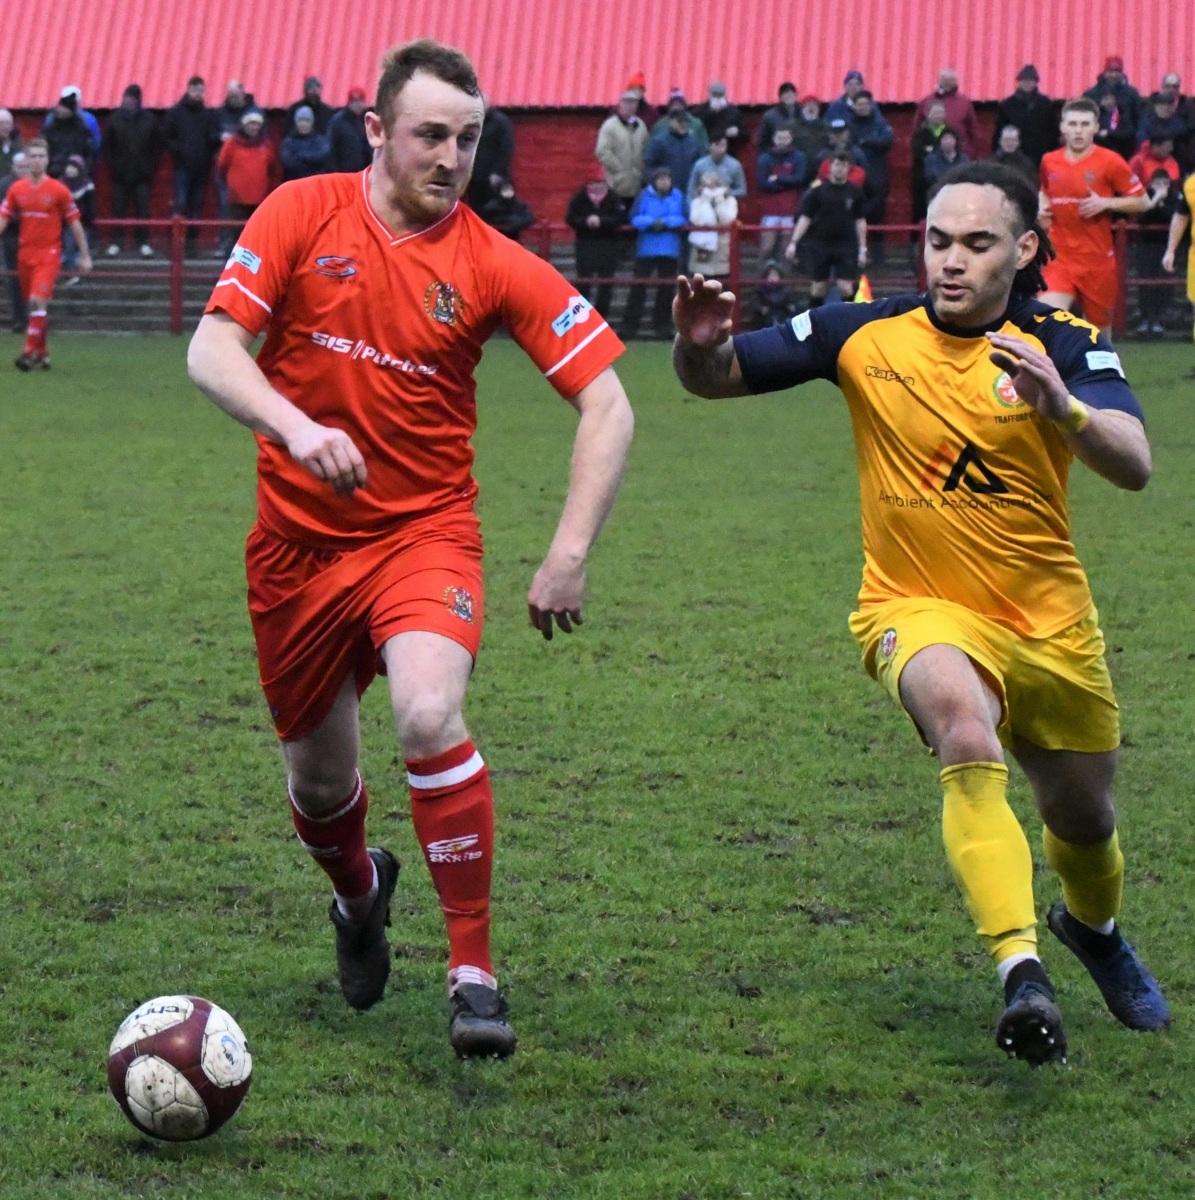 Workington-Reds-v-Trafford-Ben-Challis-16-scaled